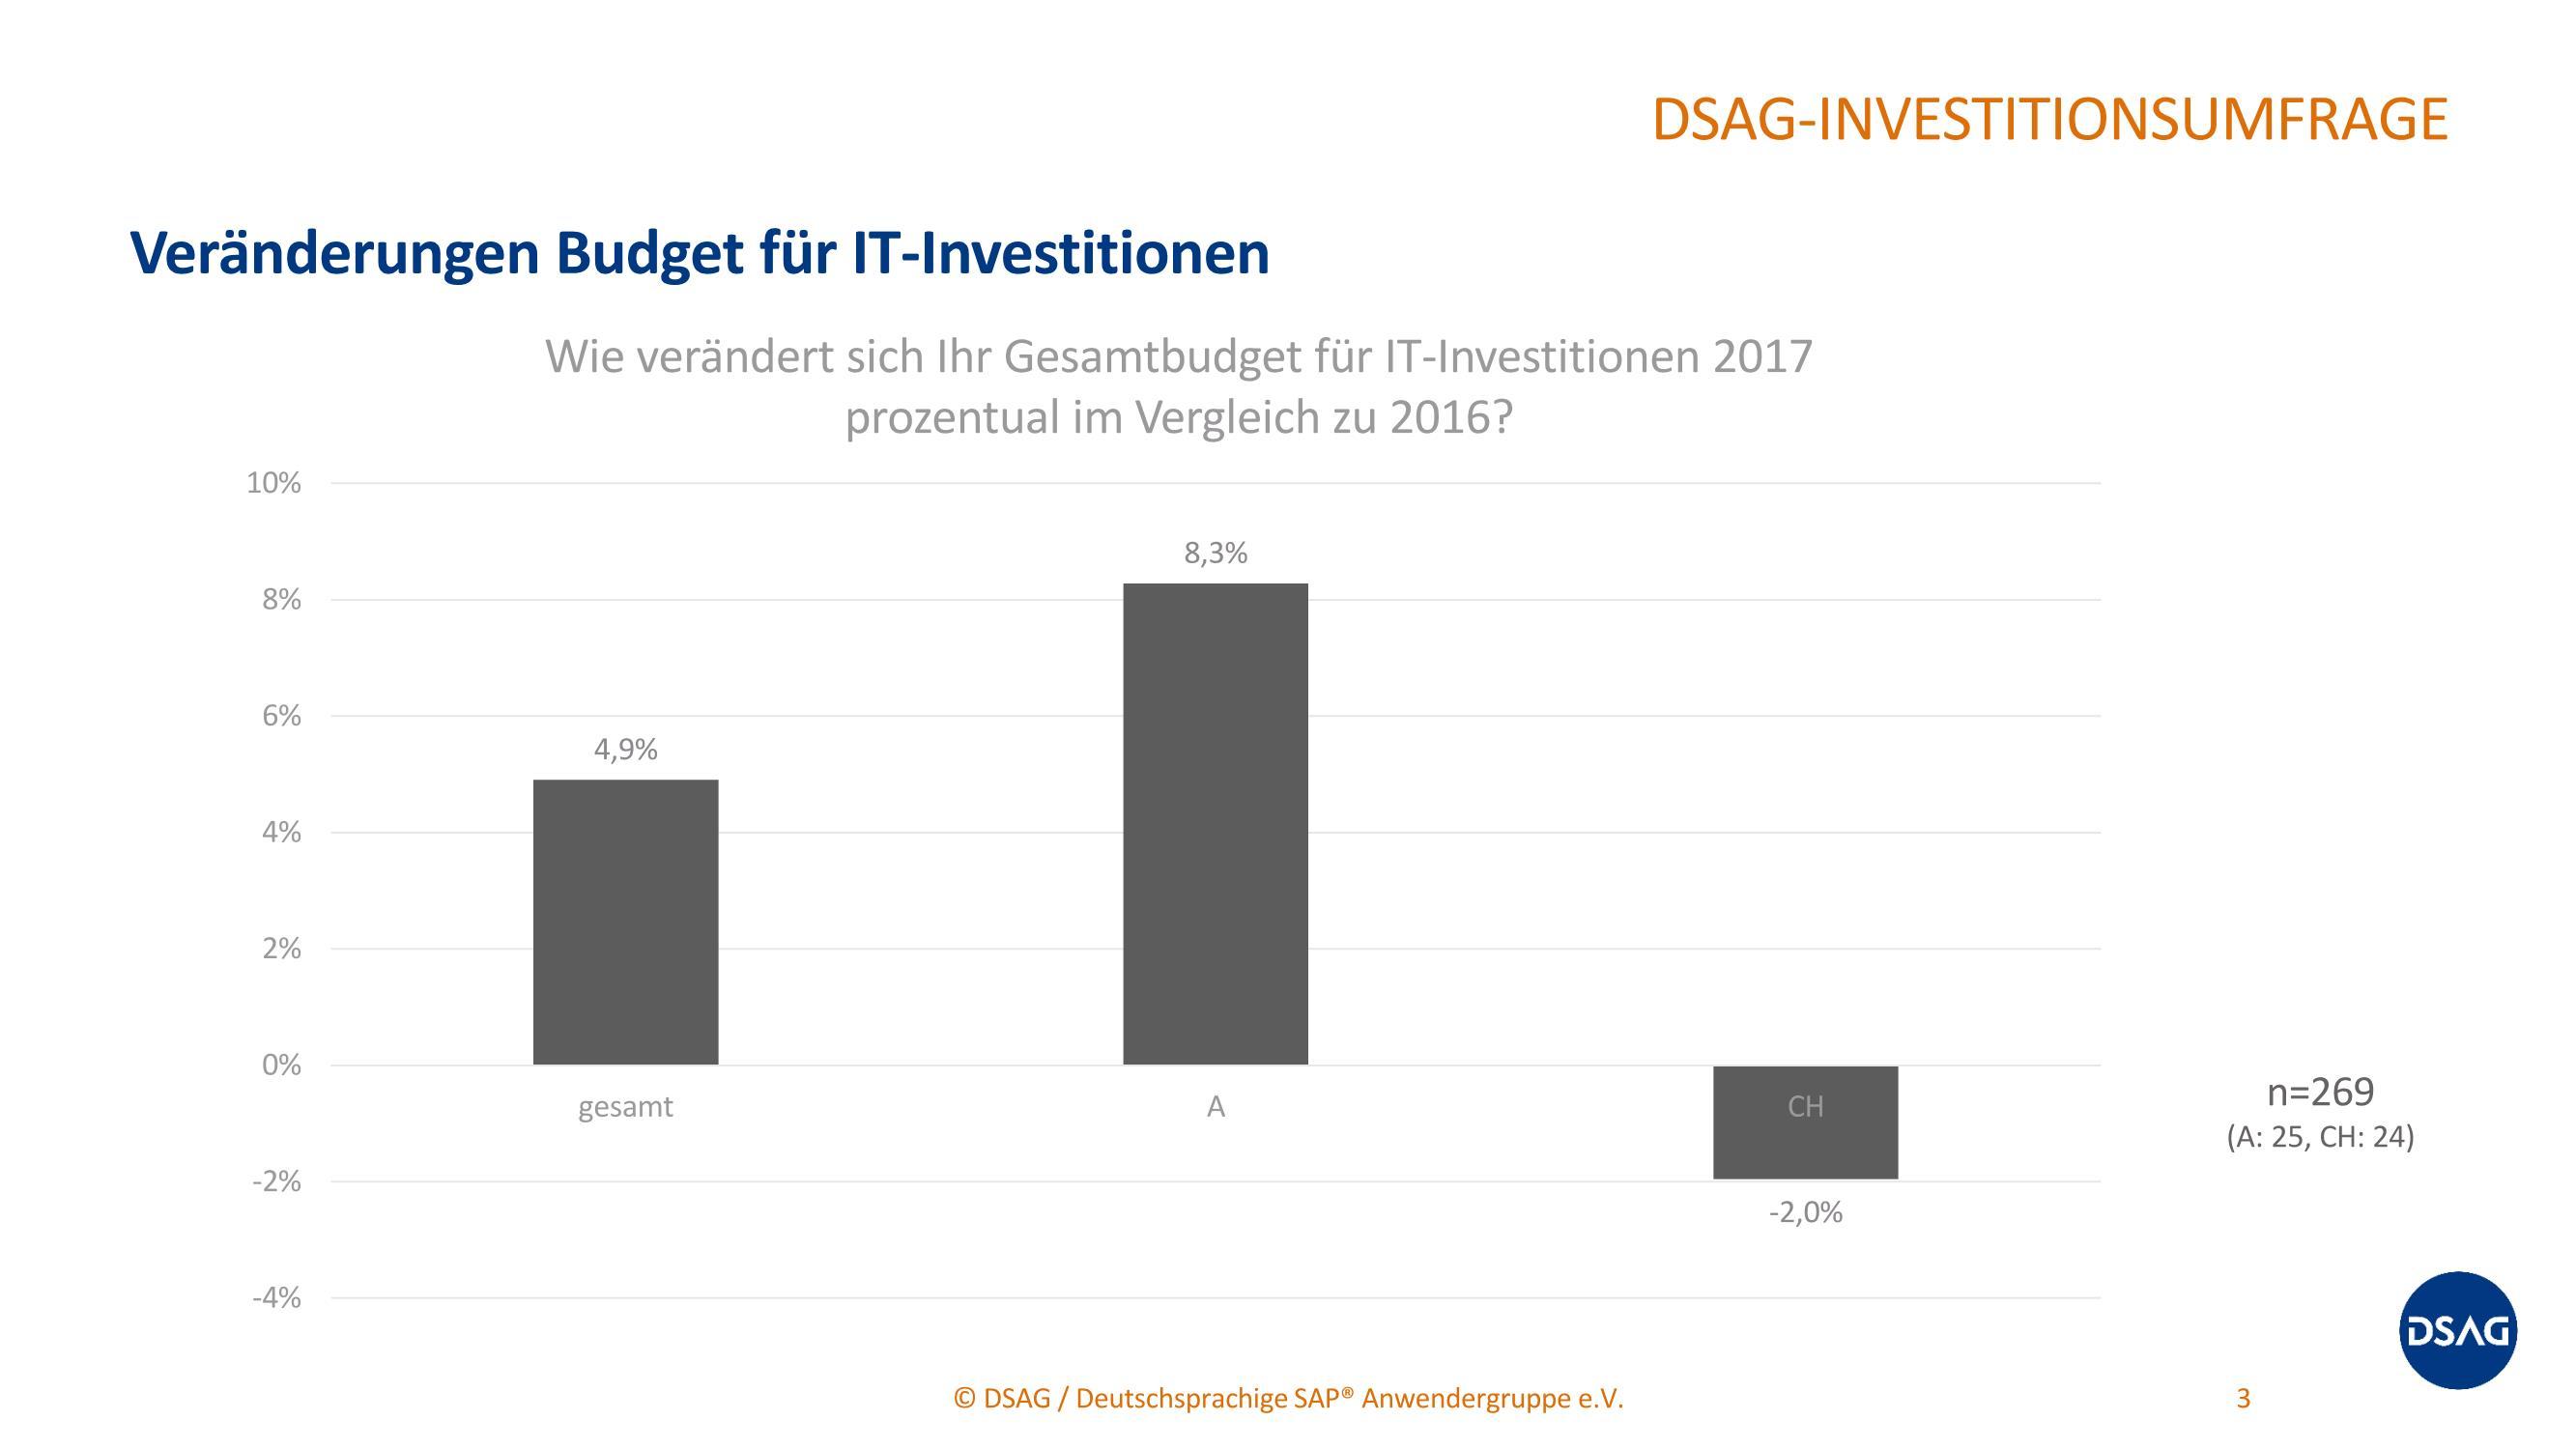 grafik dsag budget 2016 2017